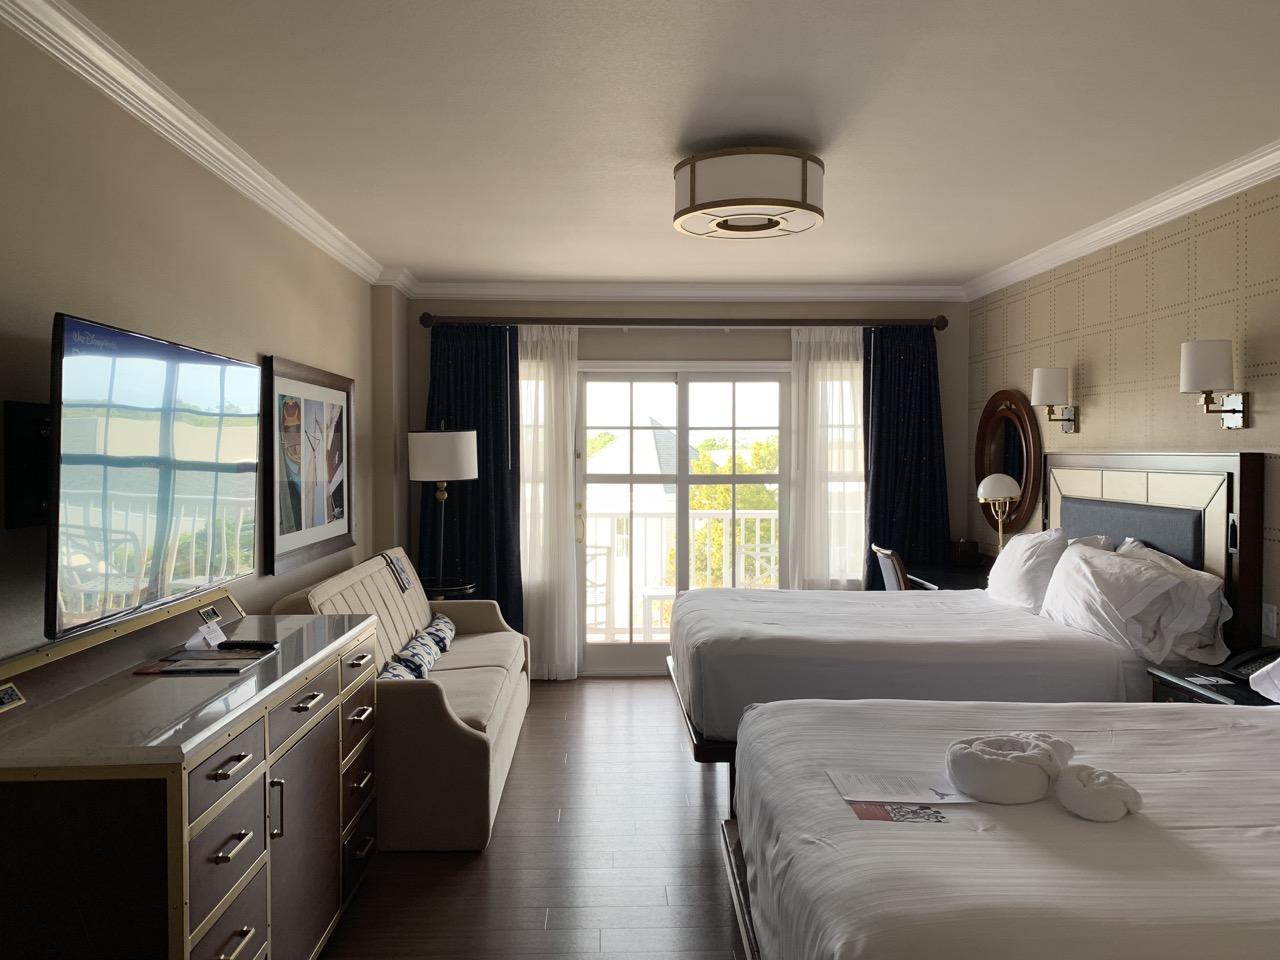 disney world best deluxe resort hotel ranking 05 yacht club room.jpeg